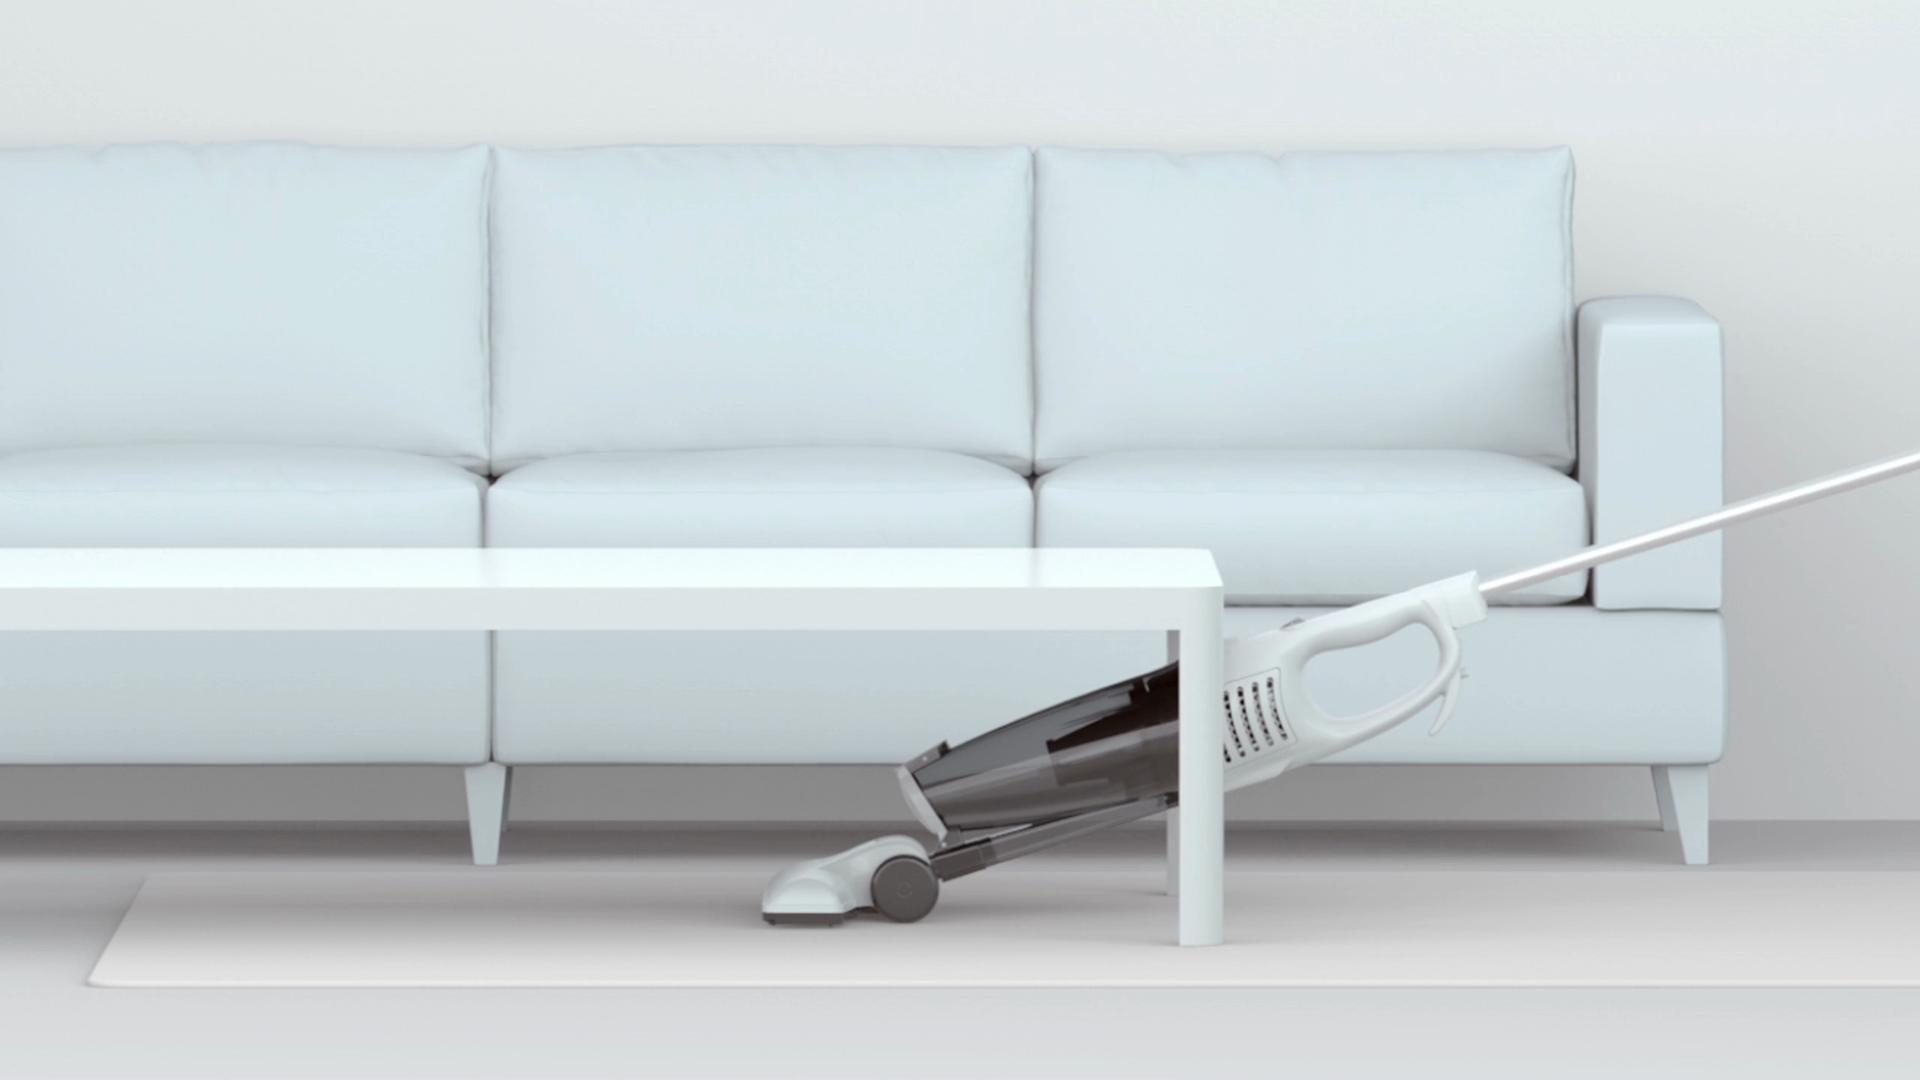 Dodocool 2 In 1 Corded Vacuum Cleaner Swivel Ultra